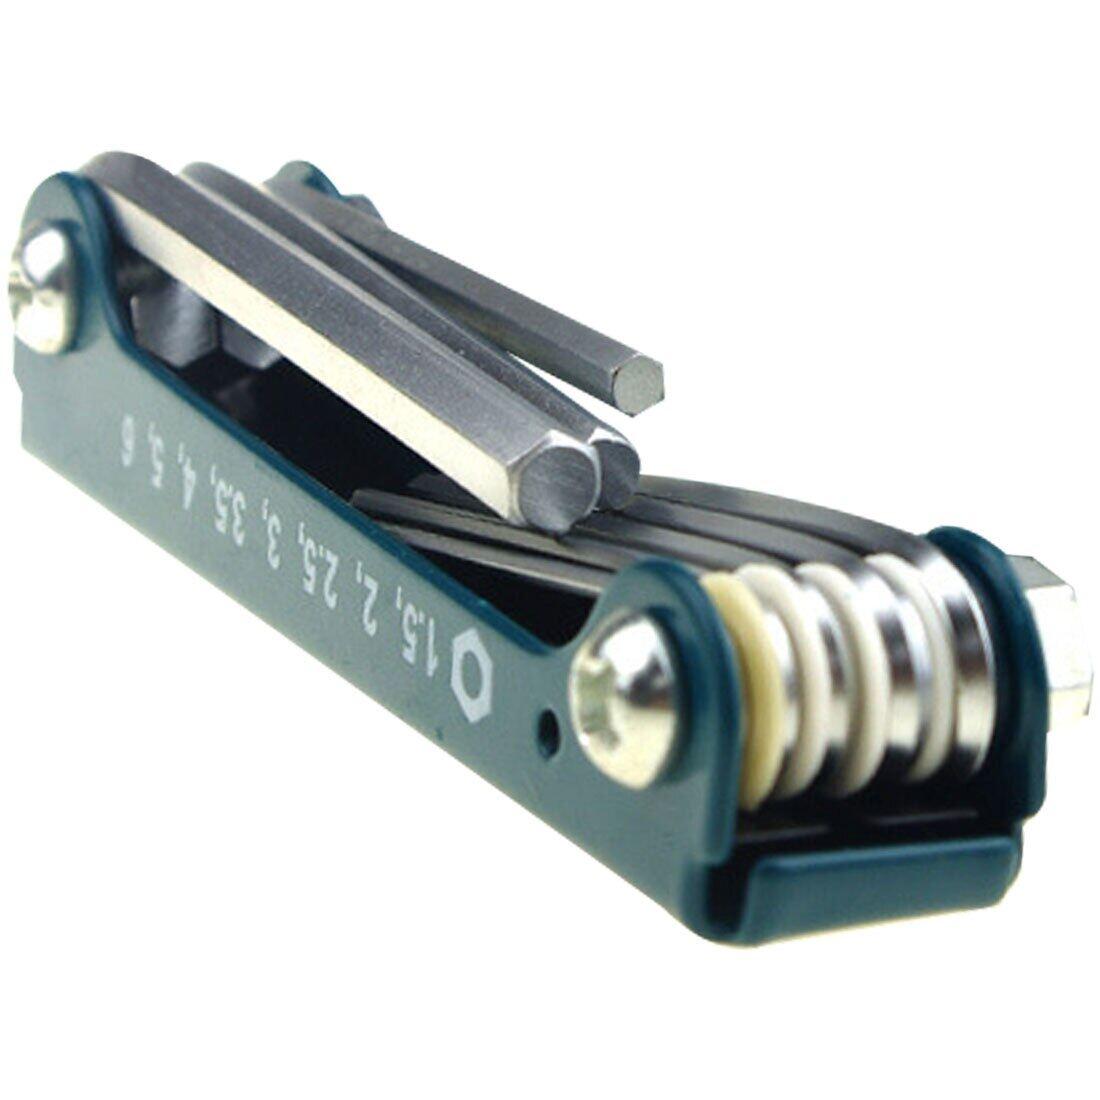 8pcs Foldable Key Hex Wrench Set Metric System Hexagon Spanner Screw Repair Tool